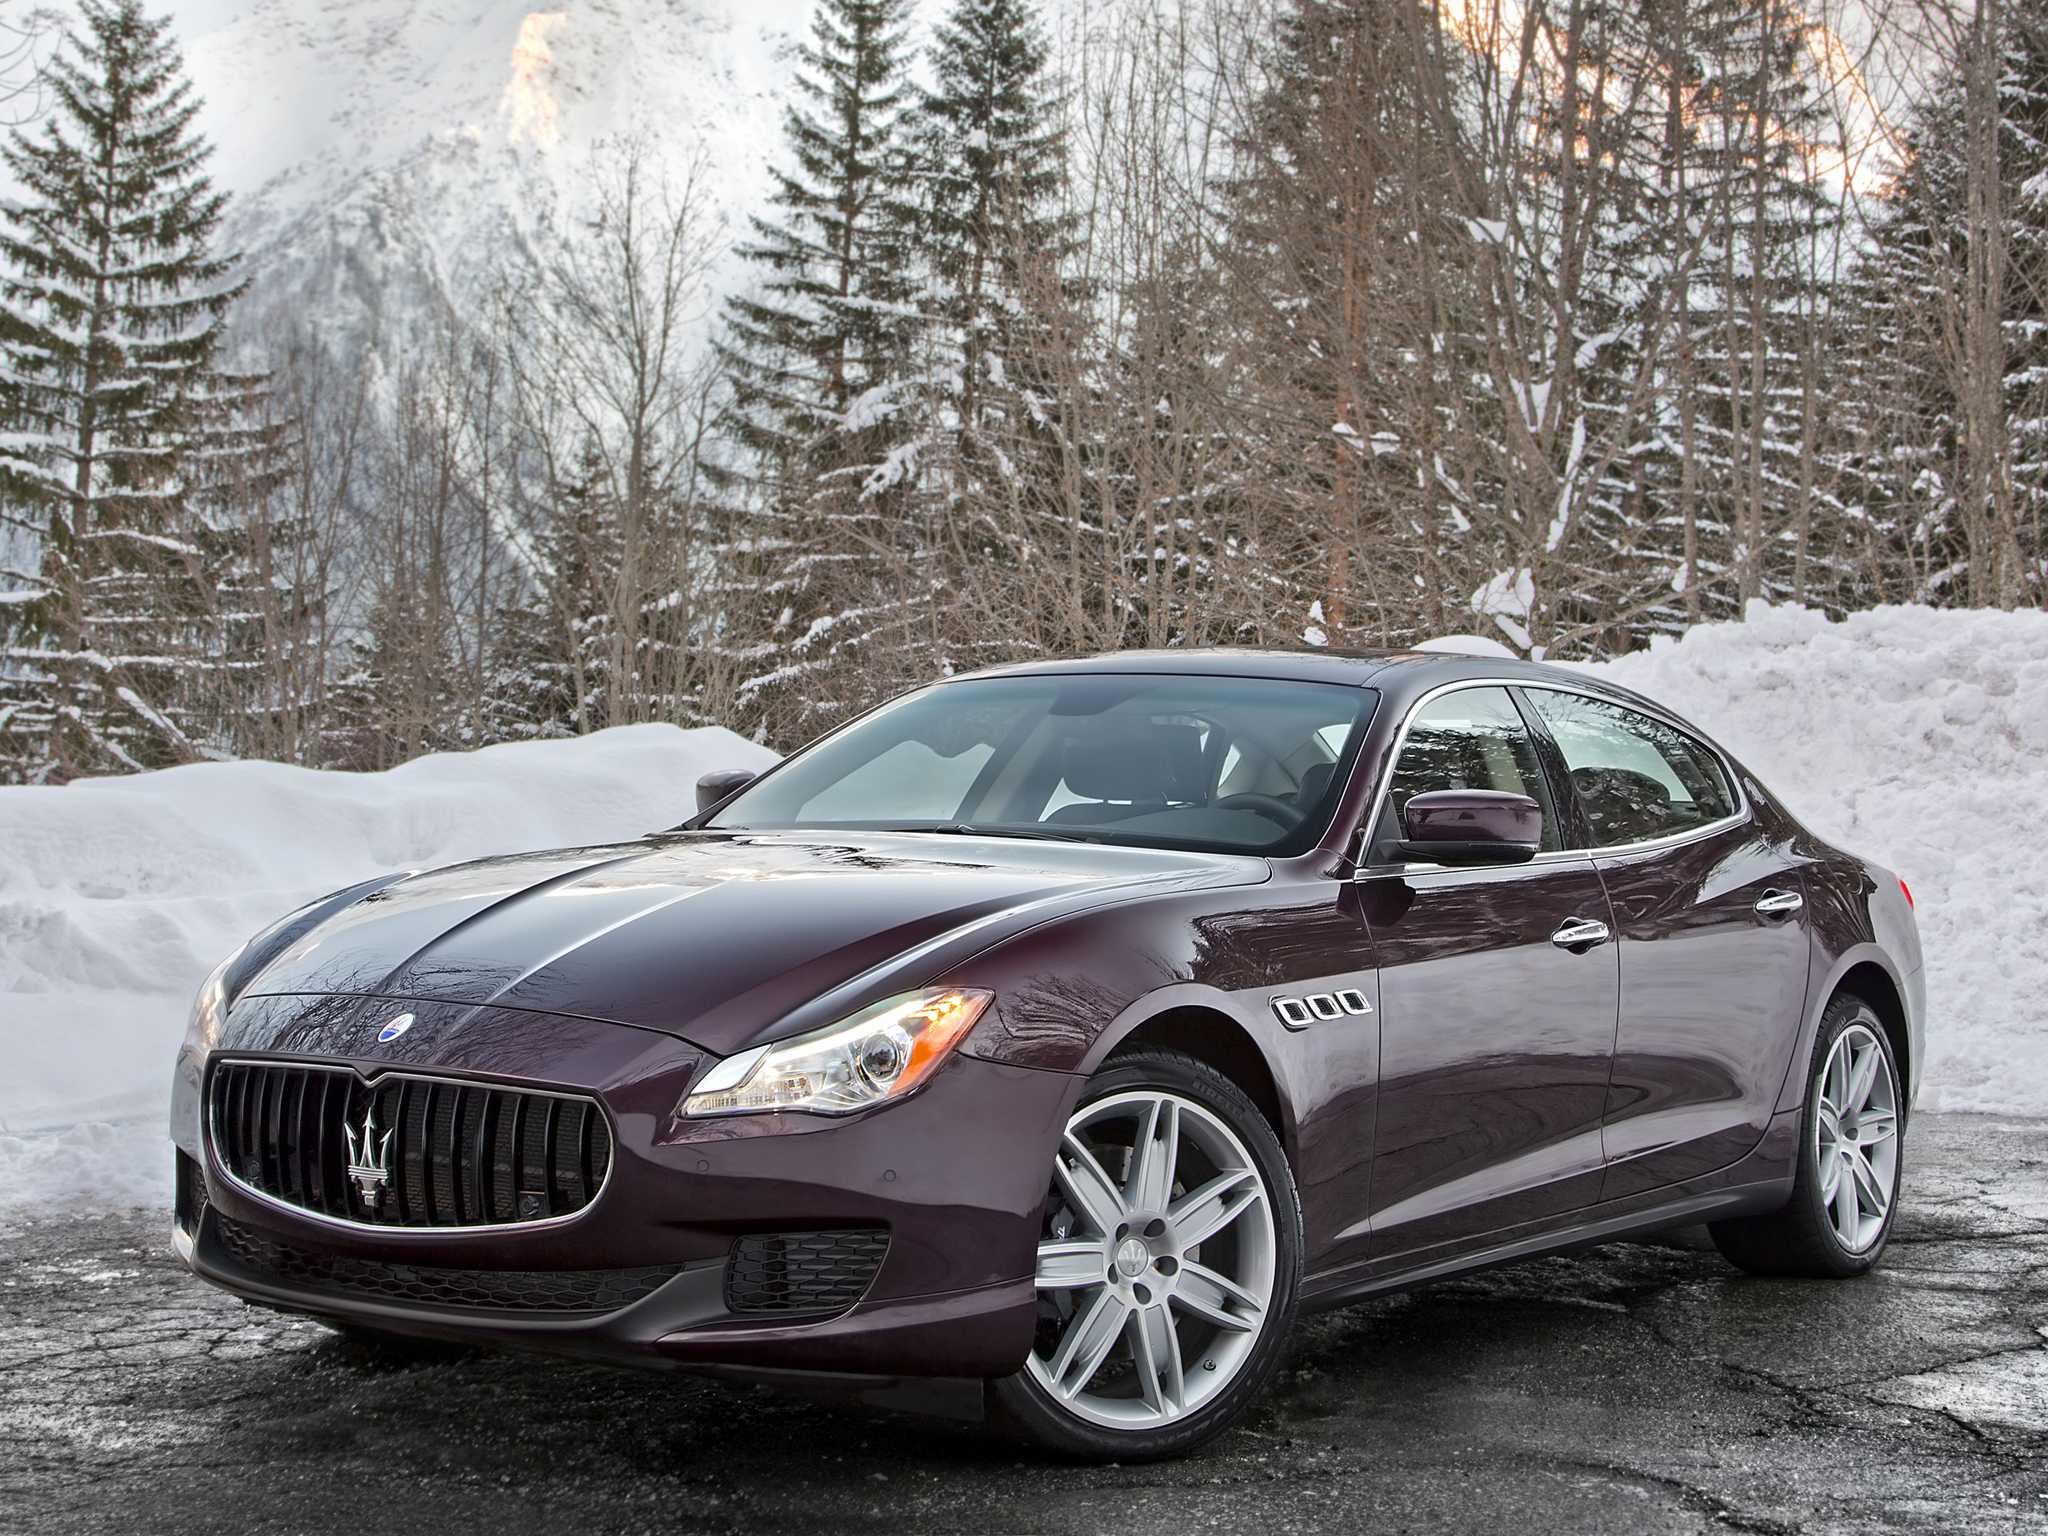 Maserati quattroporte 3.0 at s q4 (06.2014 - 10.2016) - технические характеристики